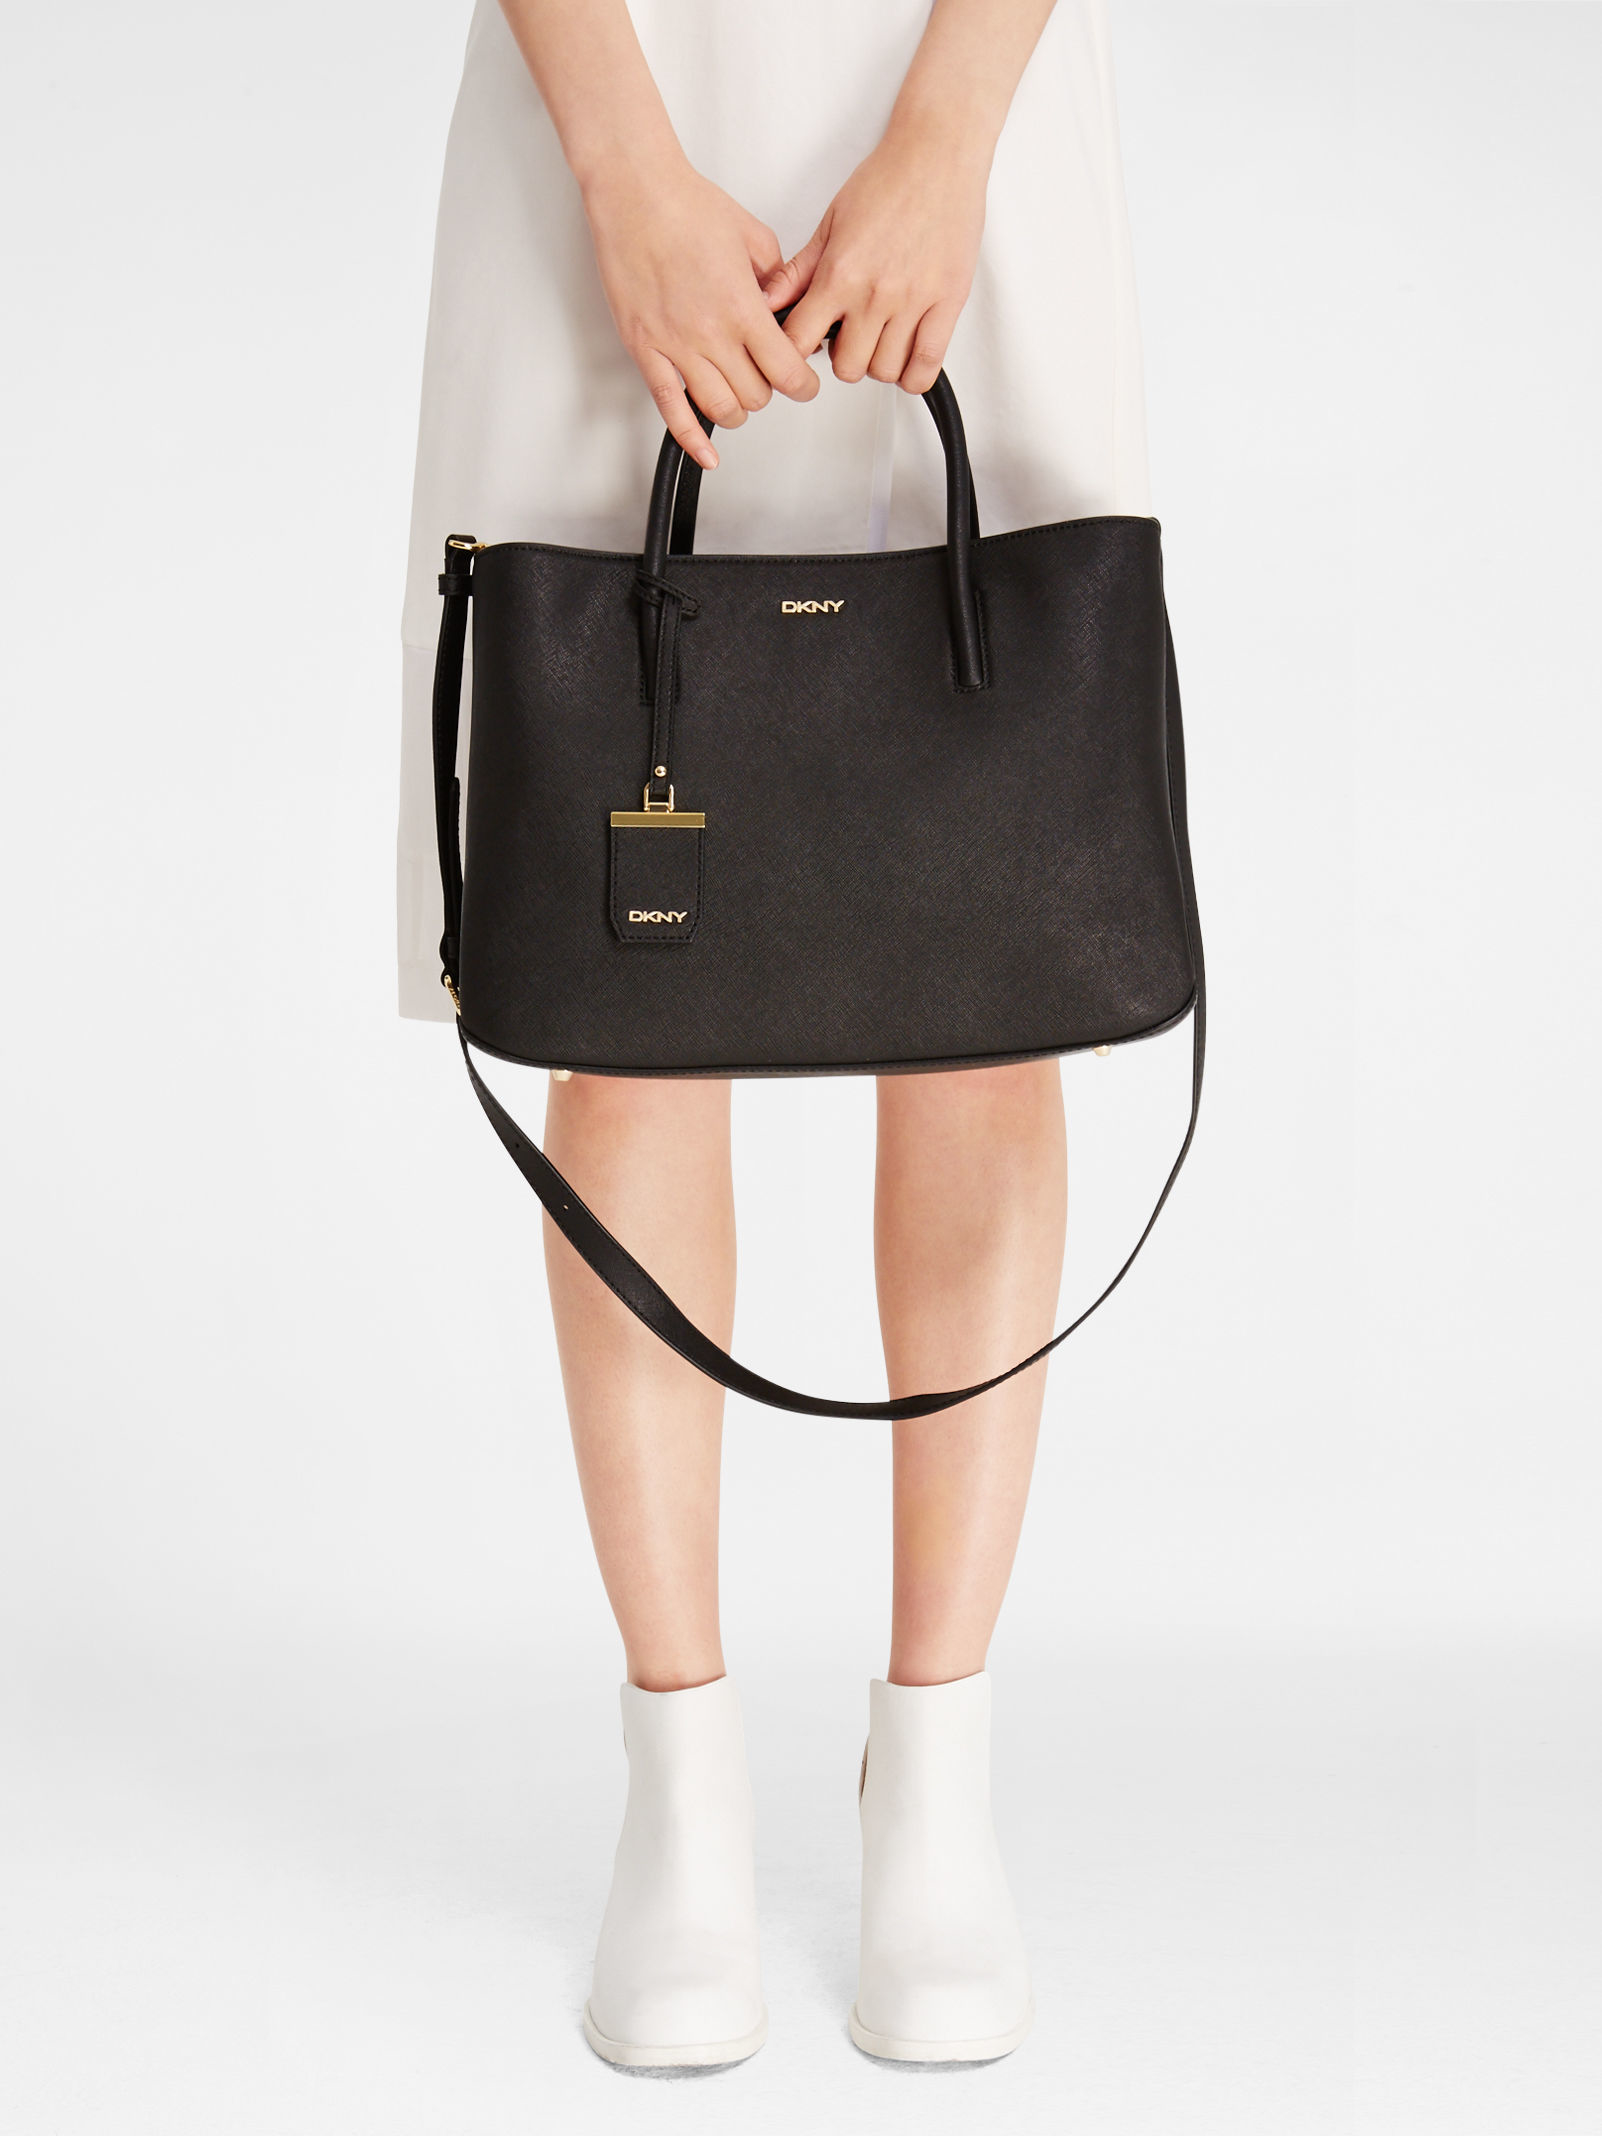 Lyst - DKNY Saffiano City Zip Shopper in Black 5d98ece7945db